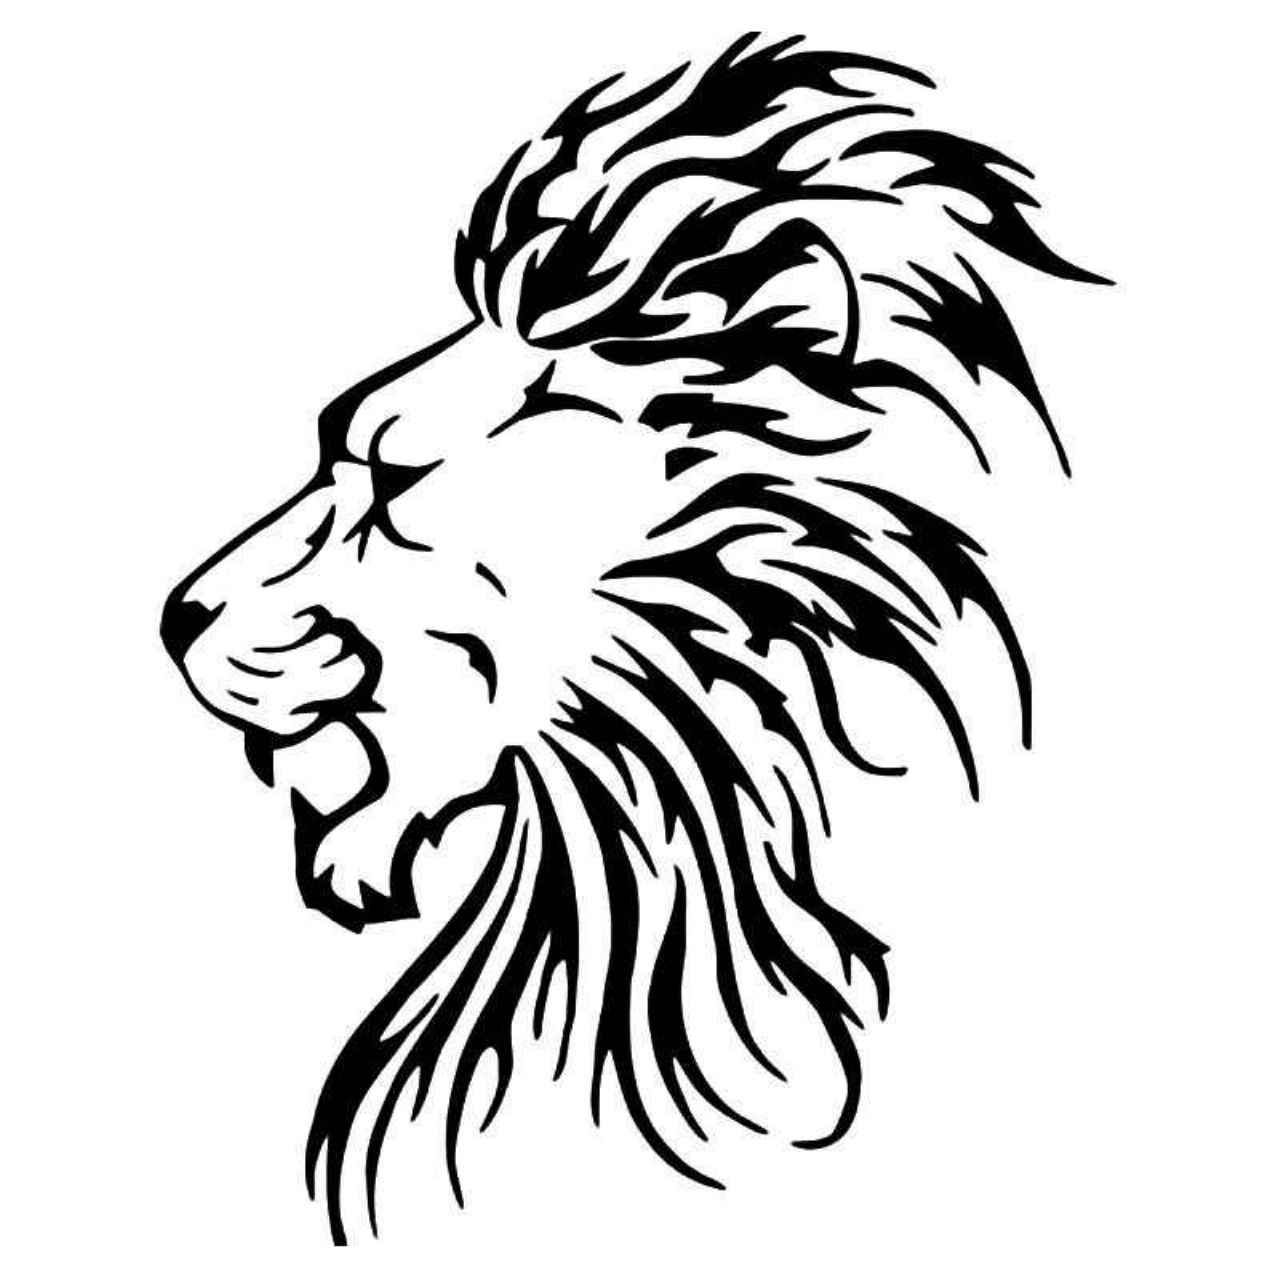 Roaring Lion Decal Sticker Black, 14 inch Exterior